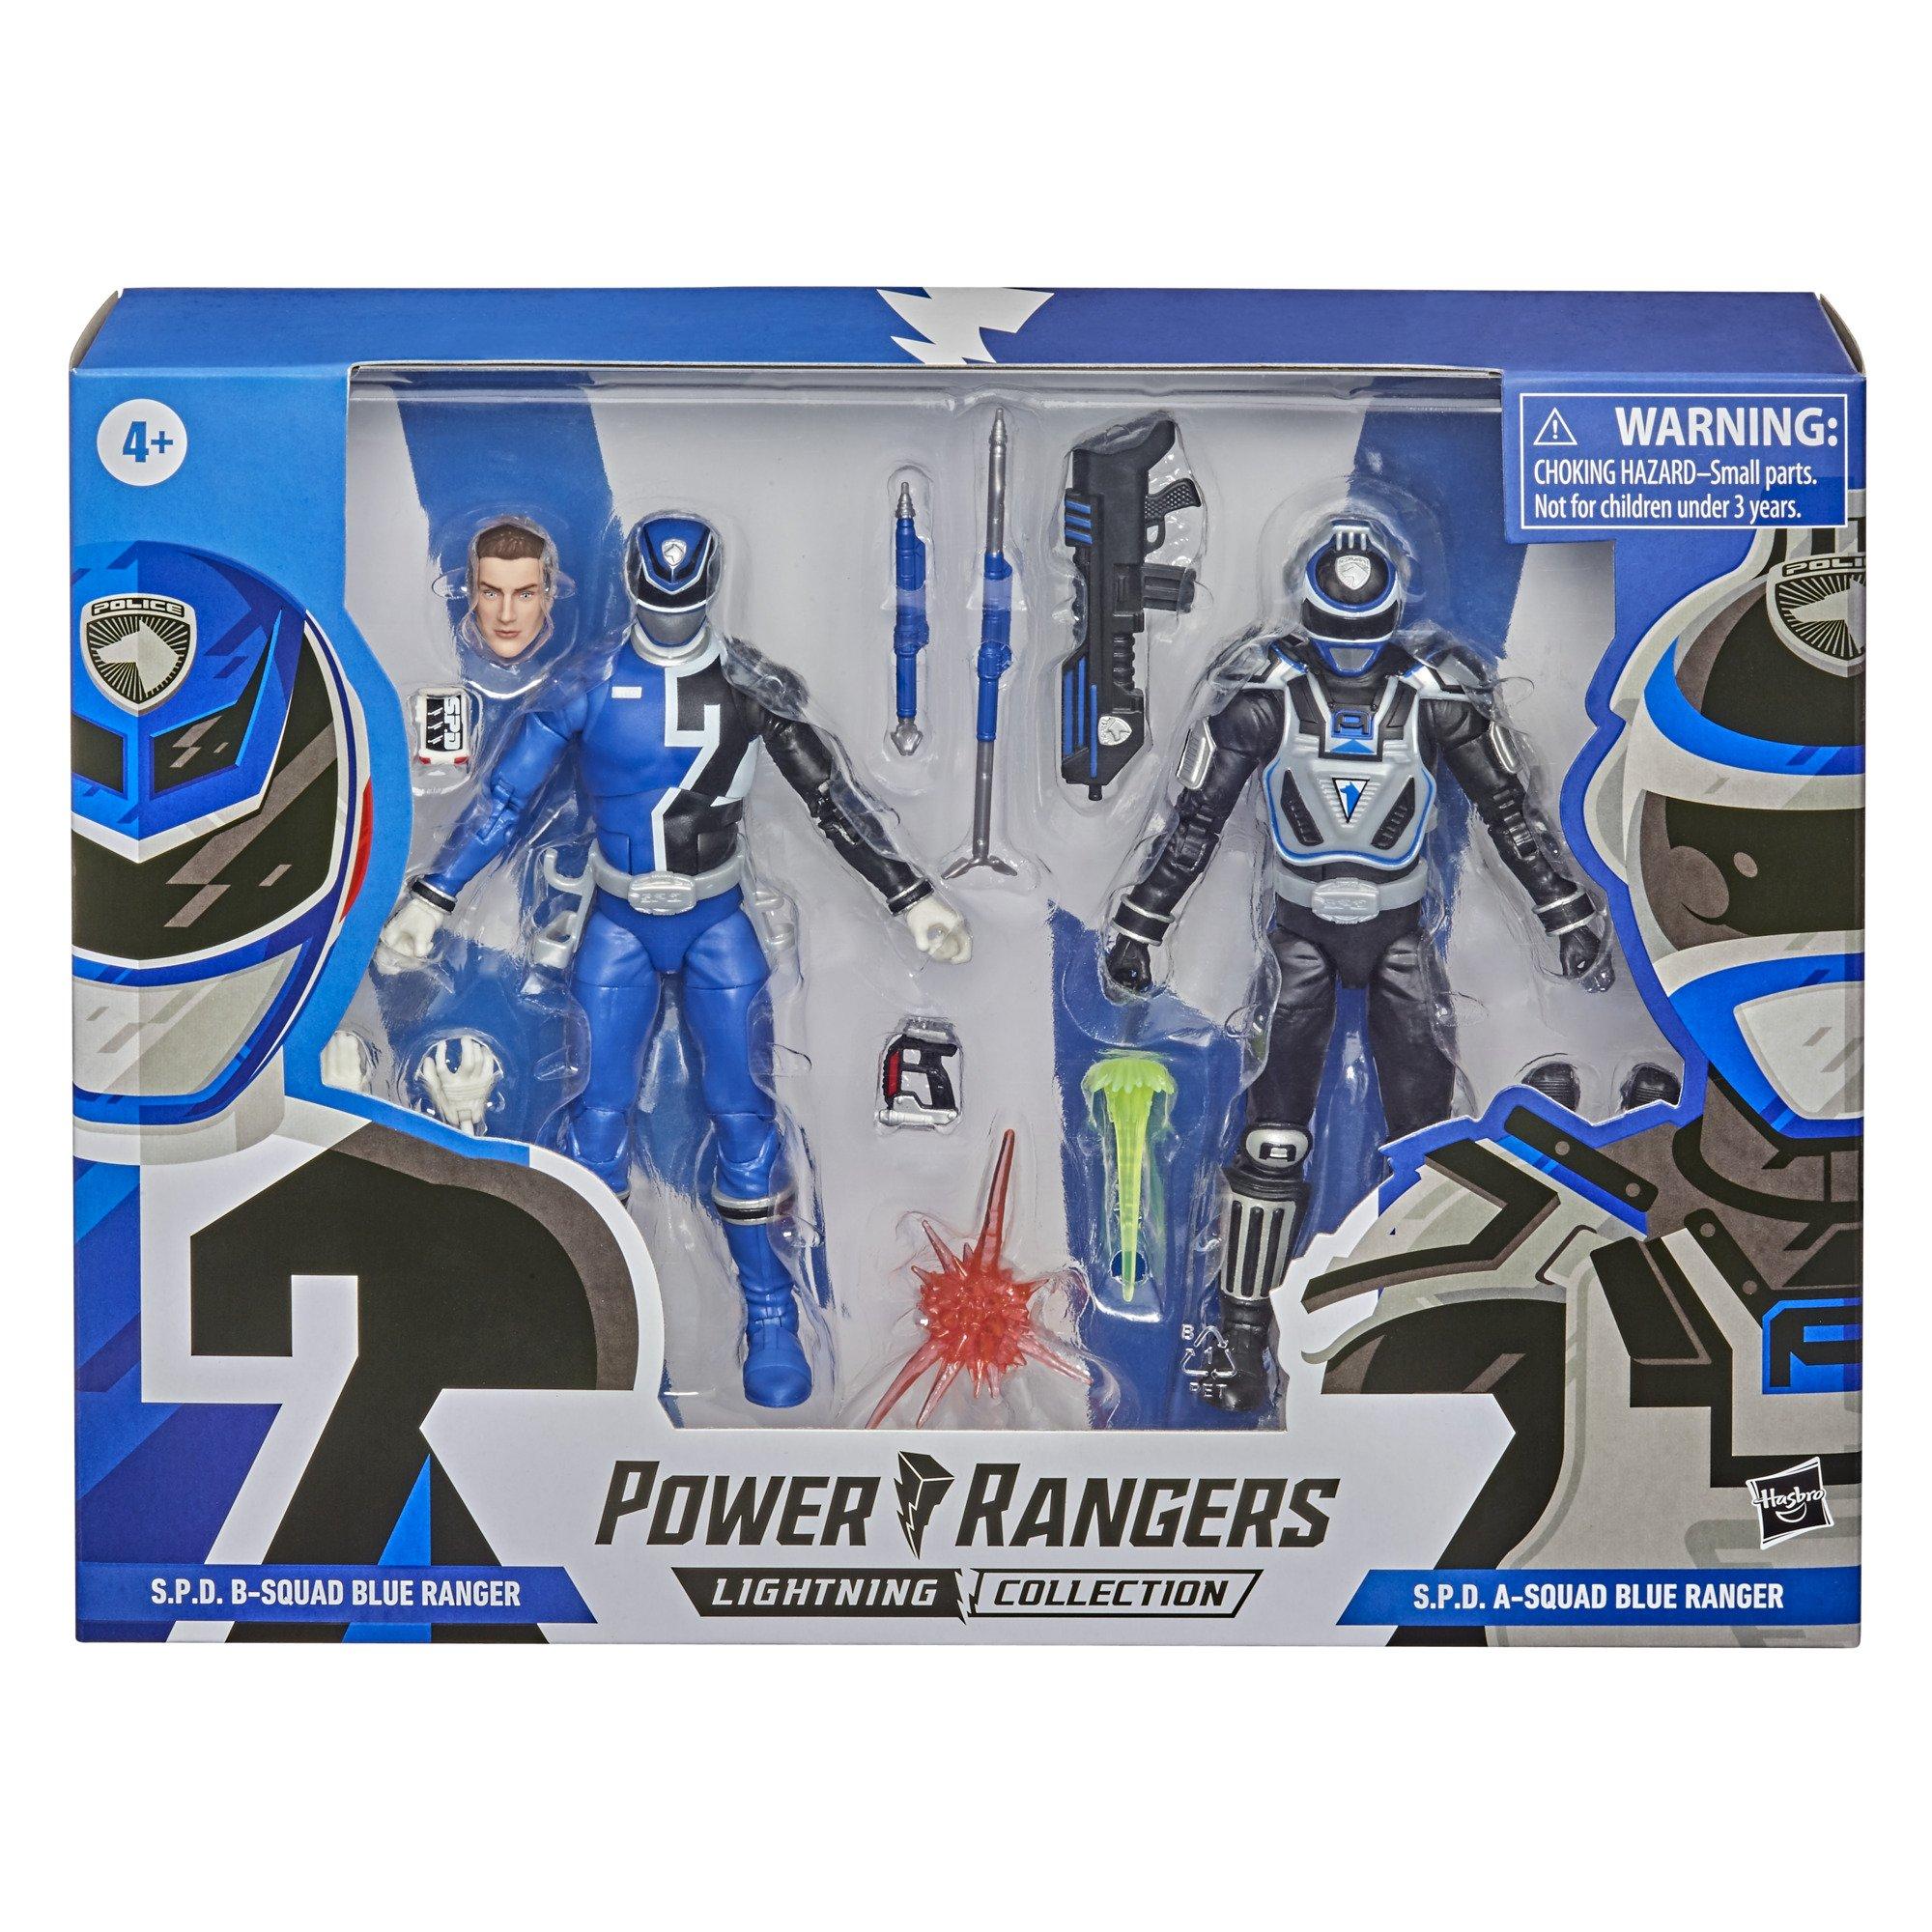 Power Rangers Lightning Collection 2 Pack - B Squad Blue S.P.D Ranger Vs. A Squad Blue S.P.D. Ranger